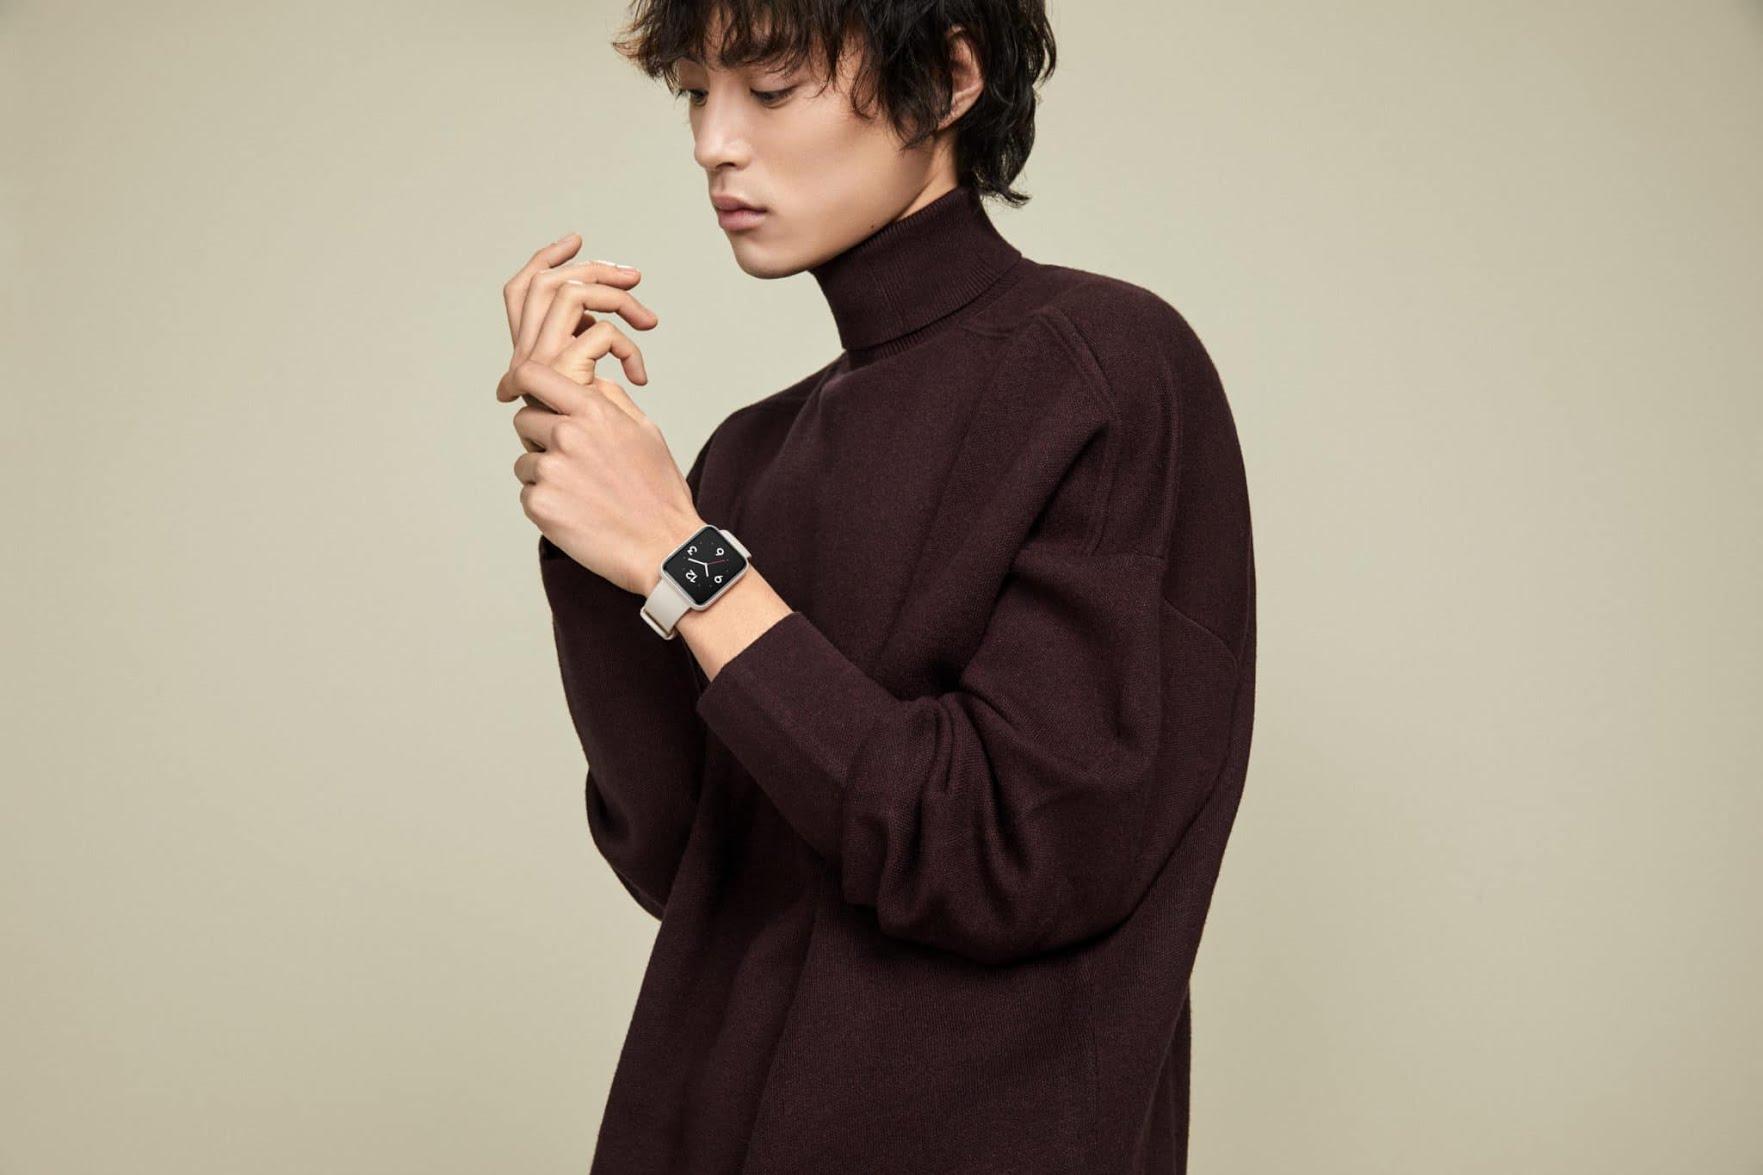 Présentation de la Mi Watch Lite Xiaomi